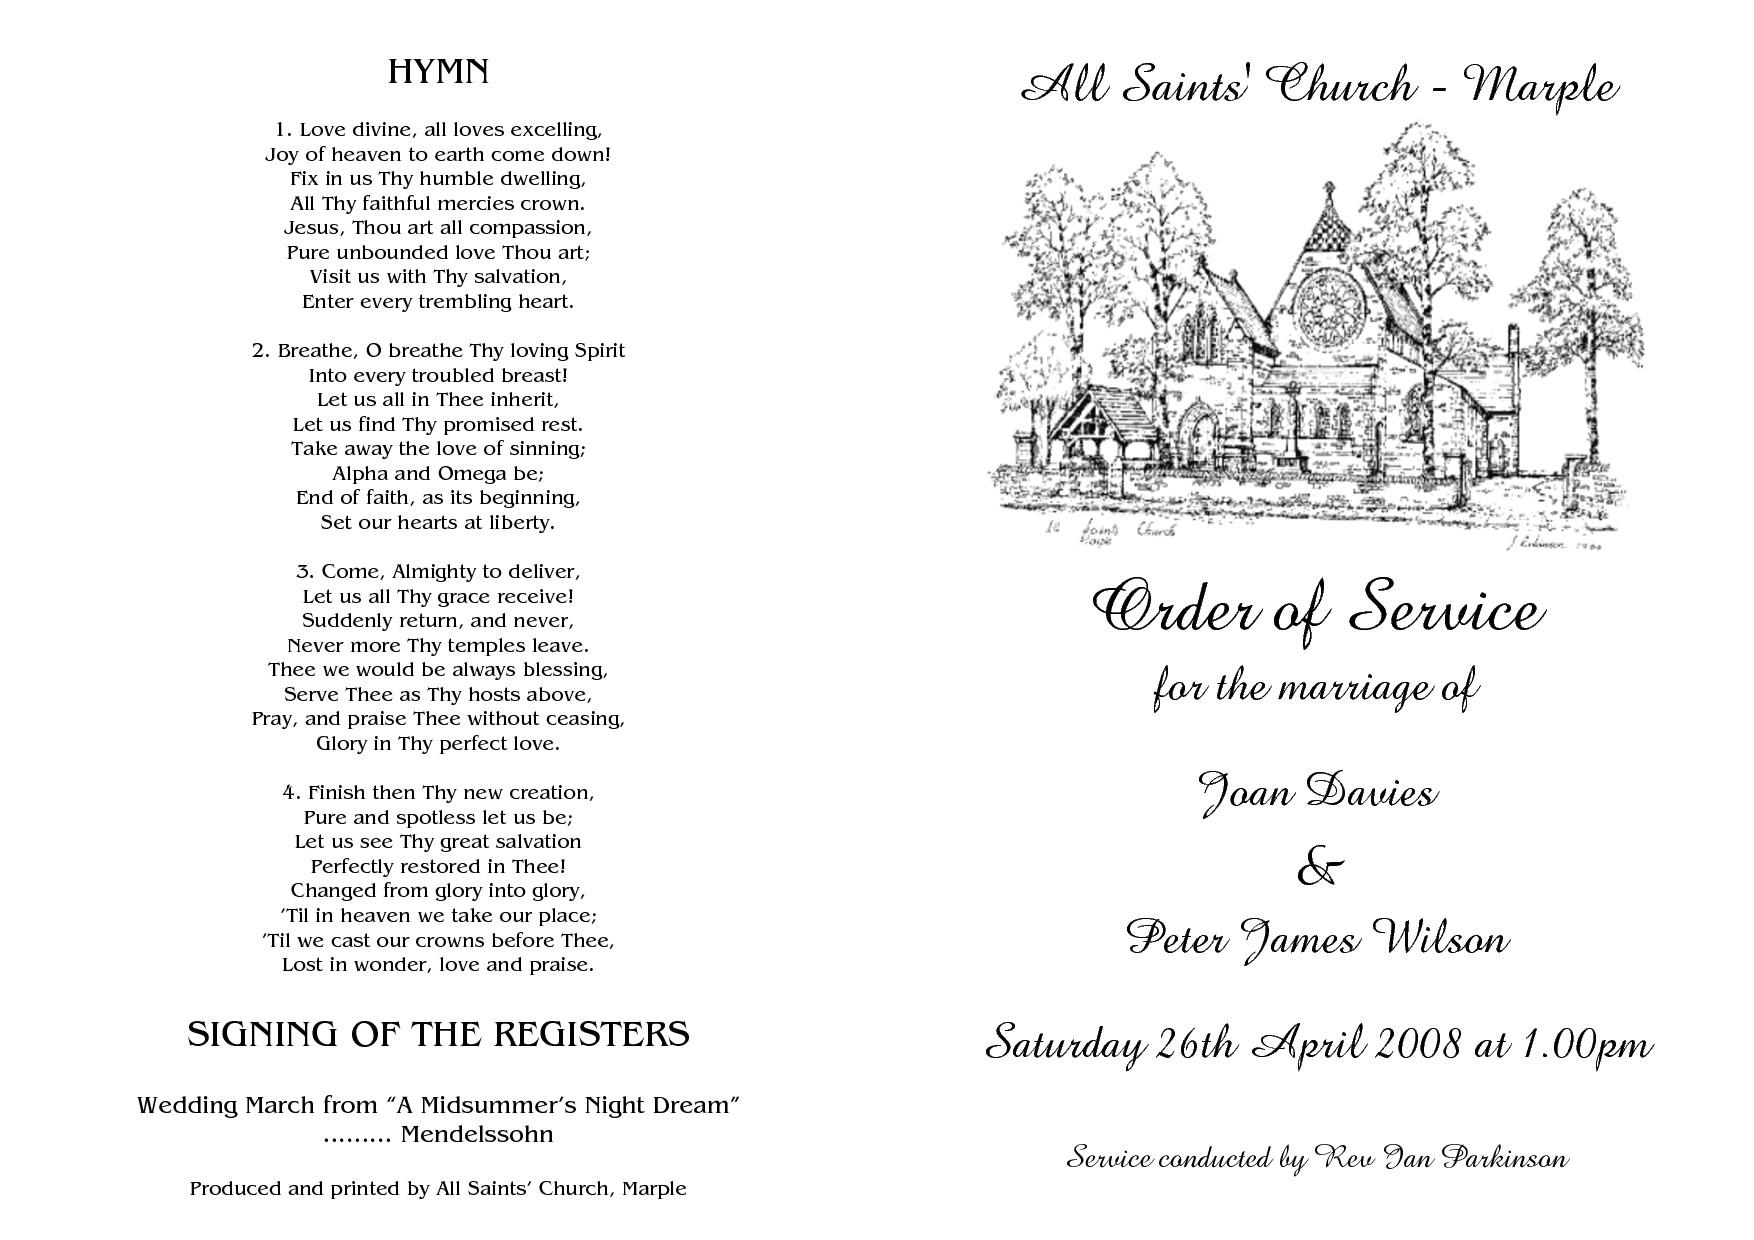 wedding order of service sample